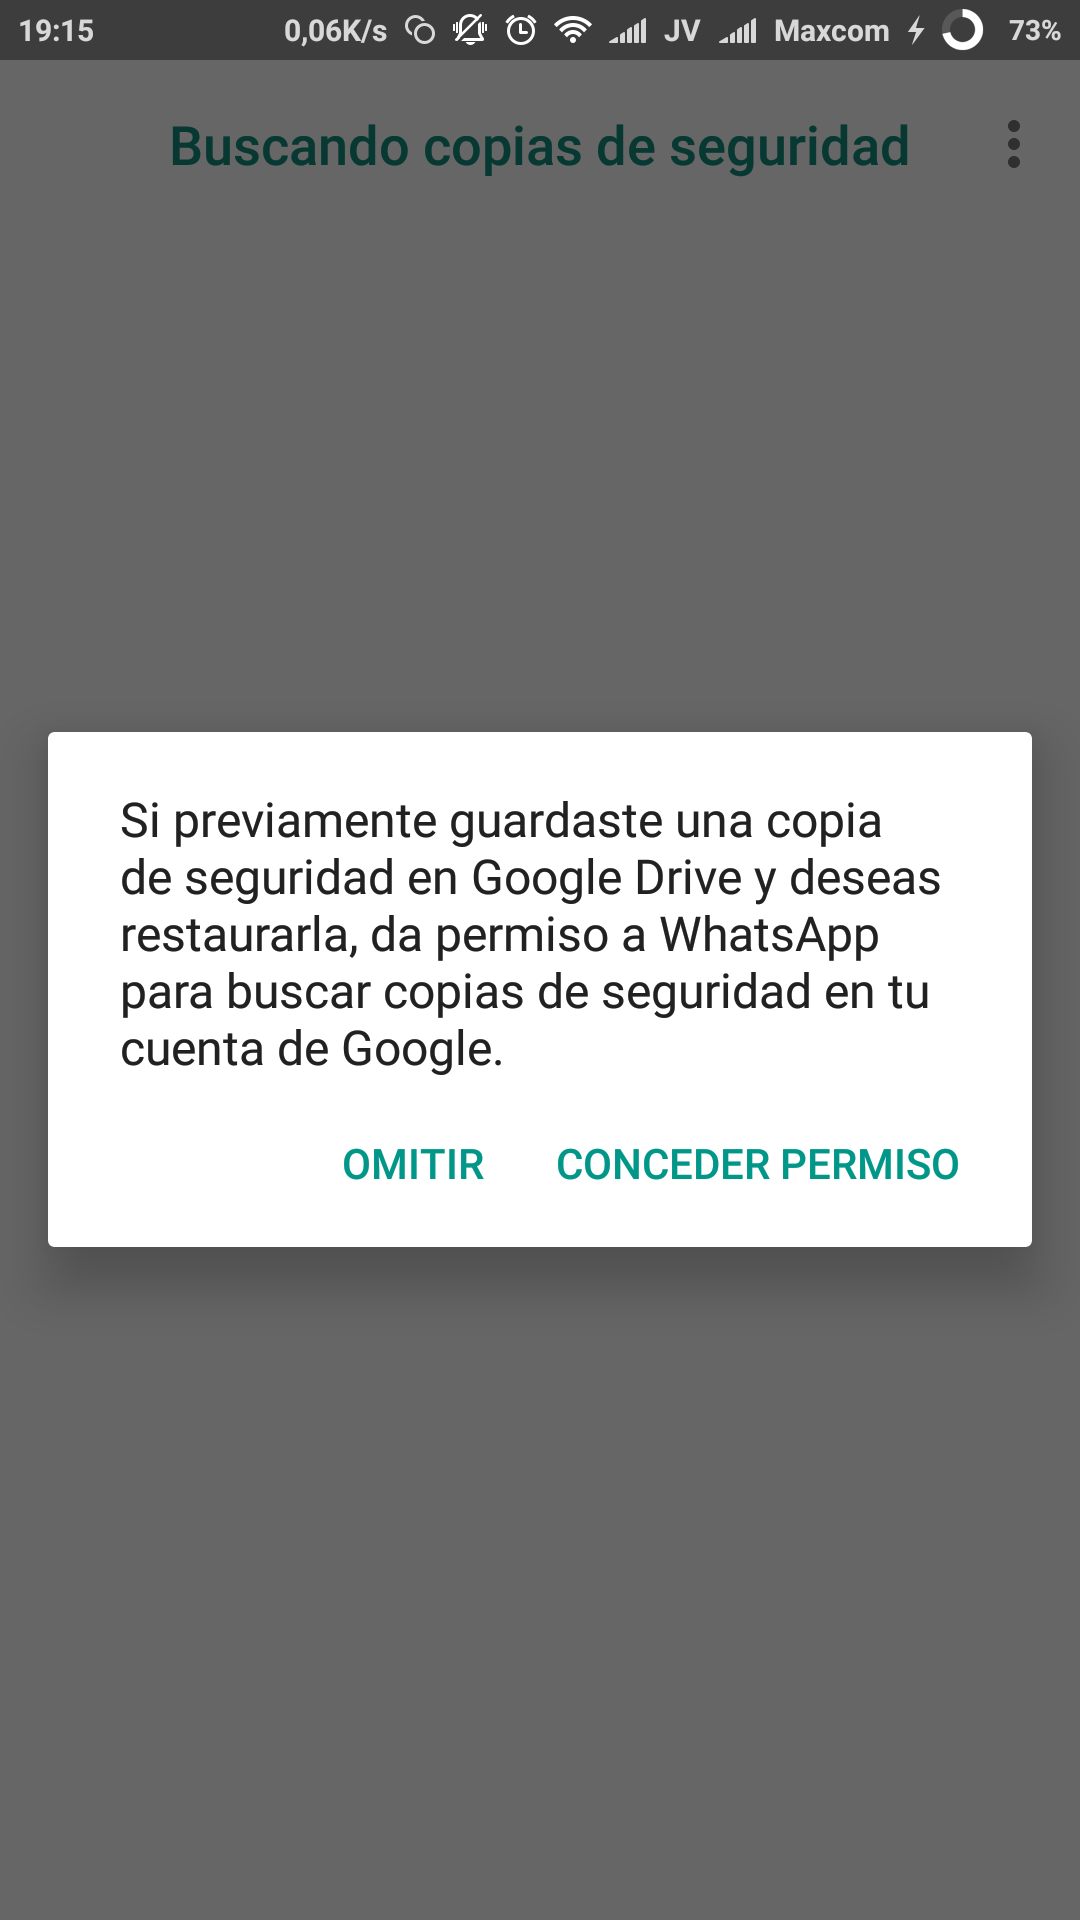 Screenshot_2017-04-19-19-15-28-001_com.whatsapp.png